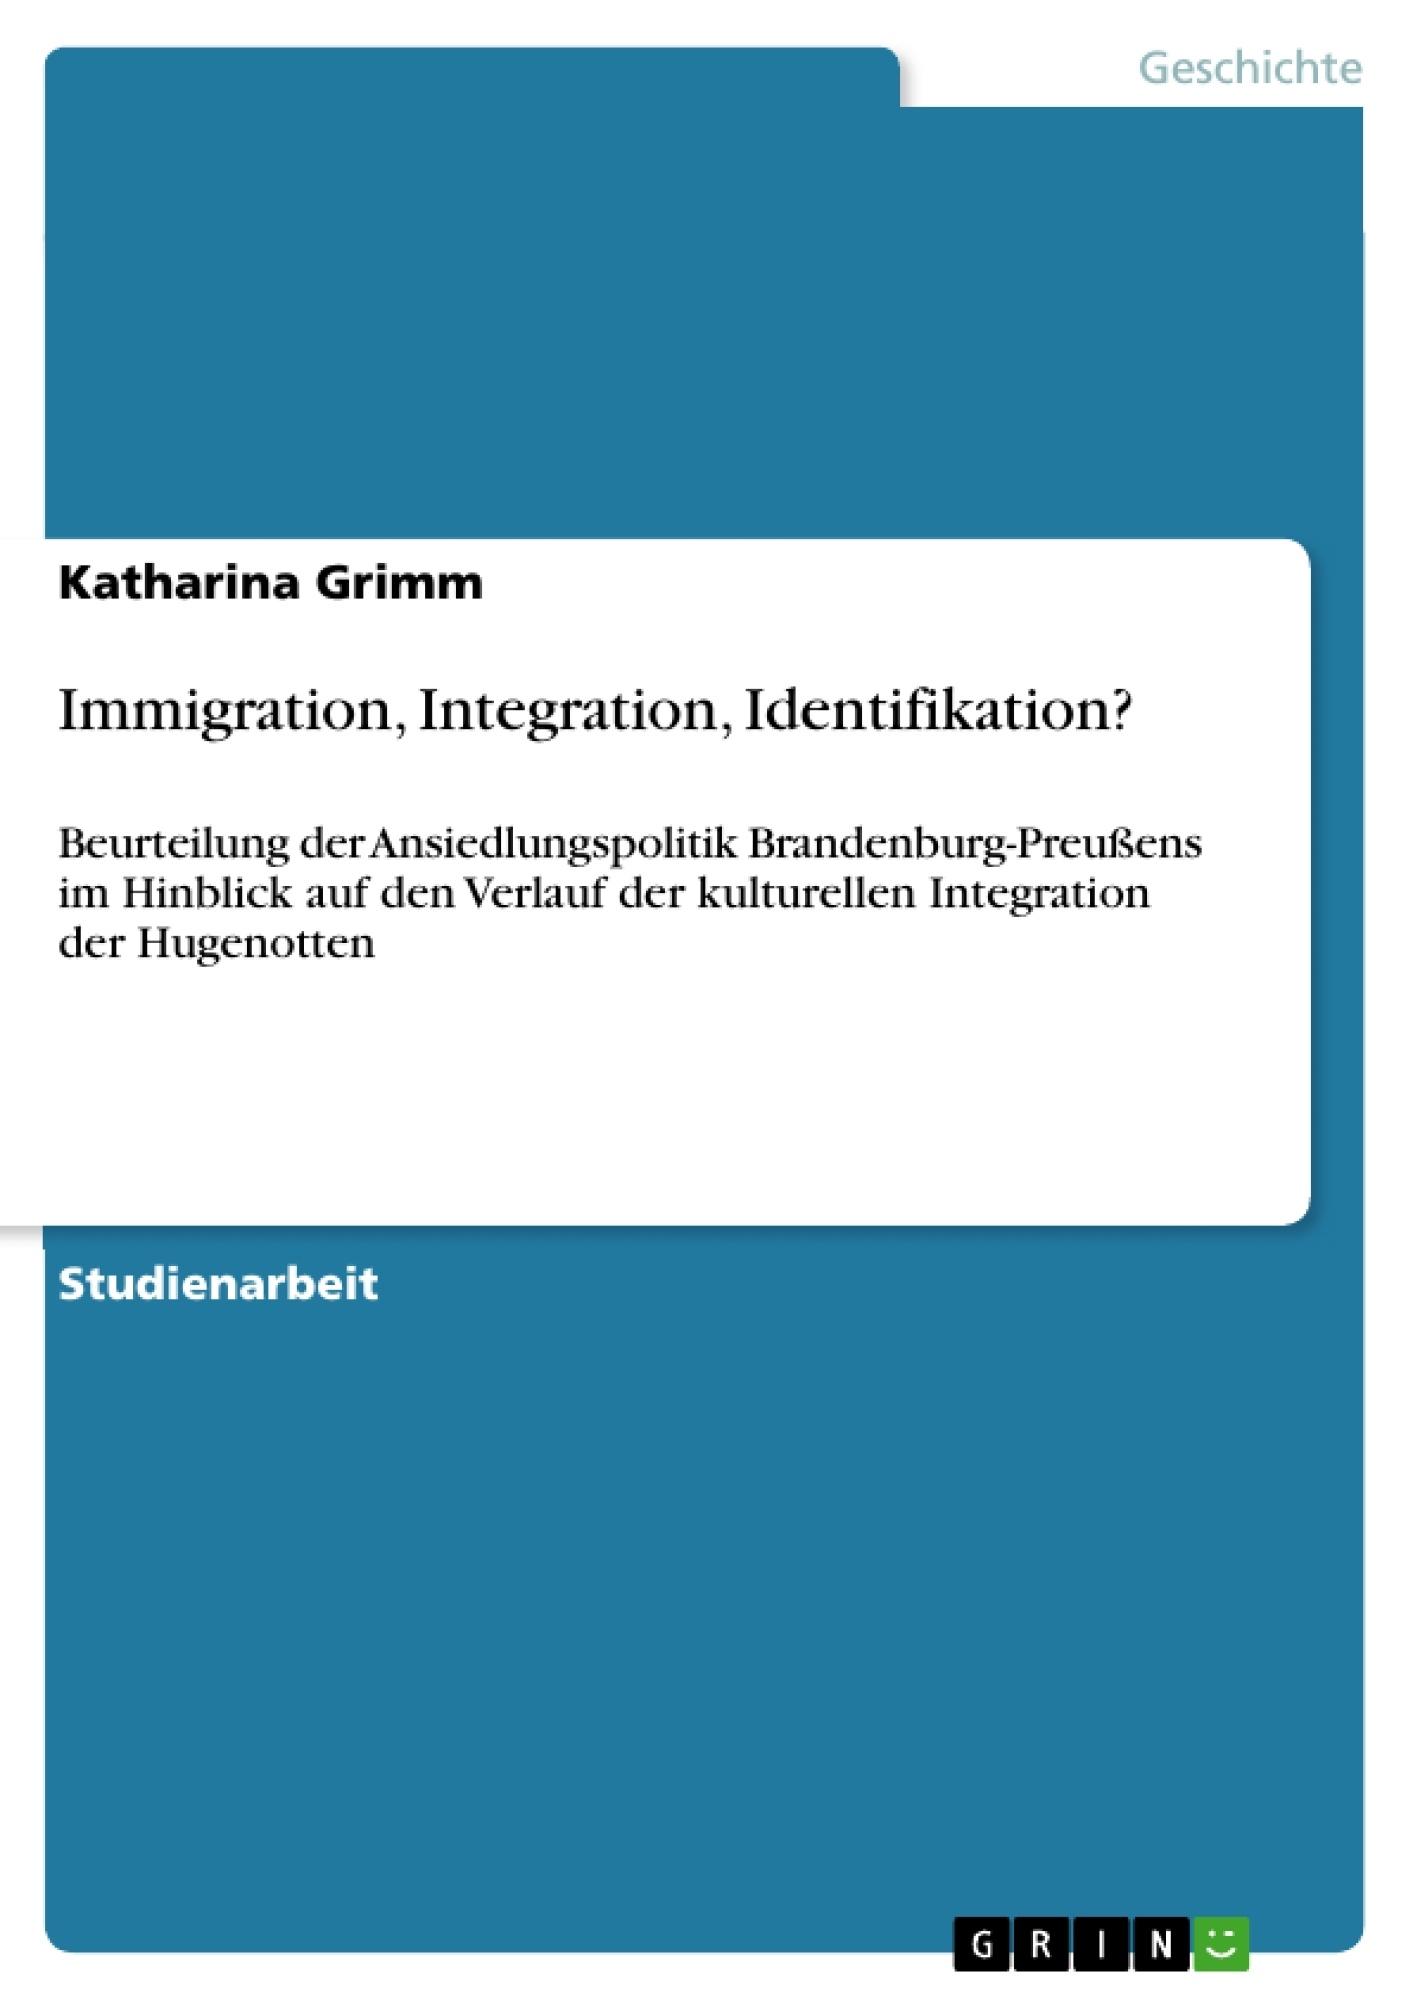 Titel: Immigration, Integration, Identifikation?